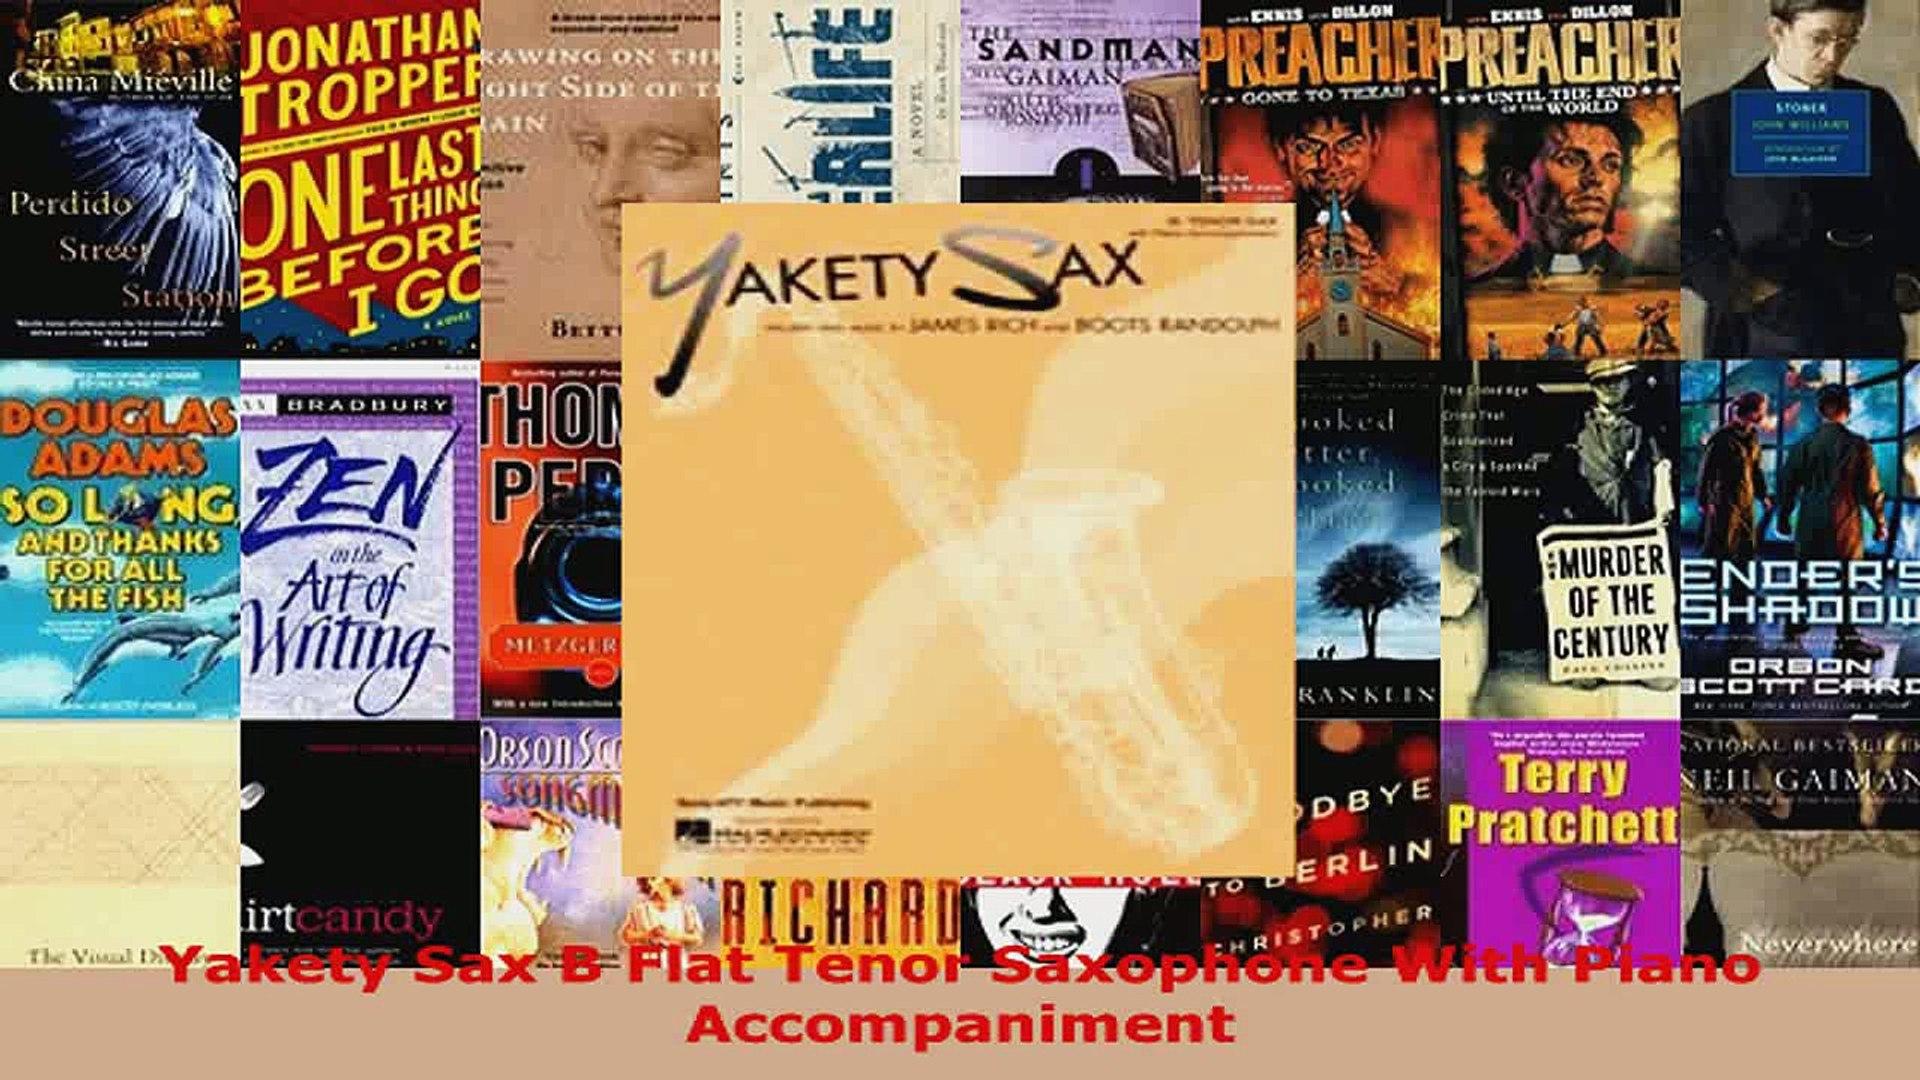 Download Yakety Sax B Flat Tenor Saxophone With Piano Accompaniment PDF  Online